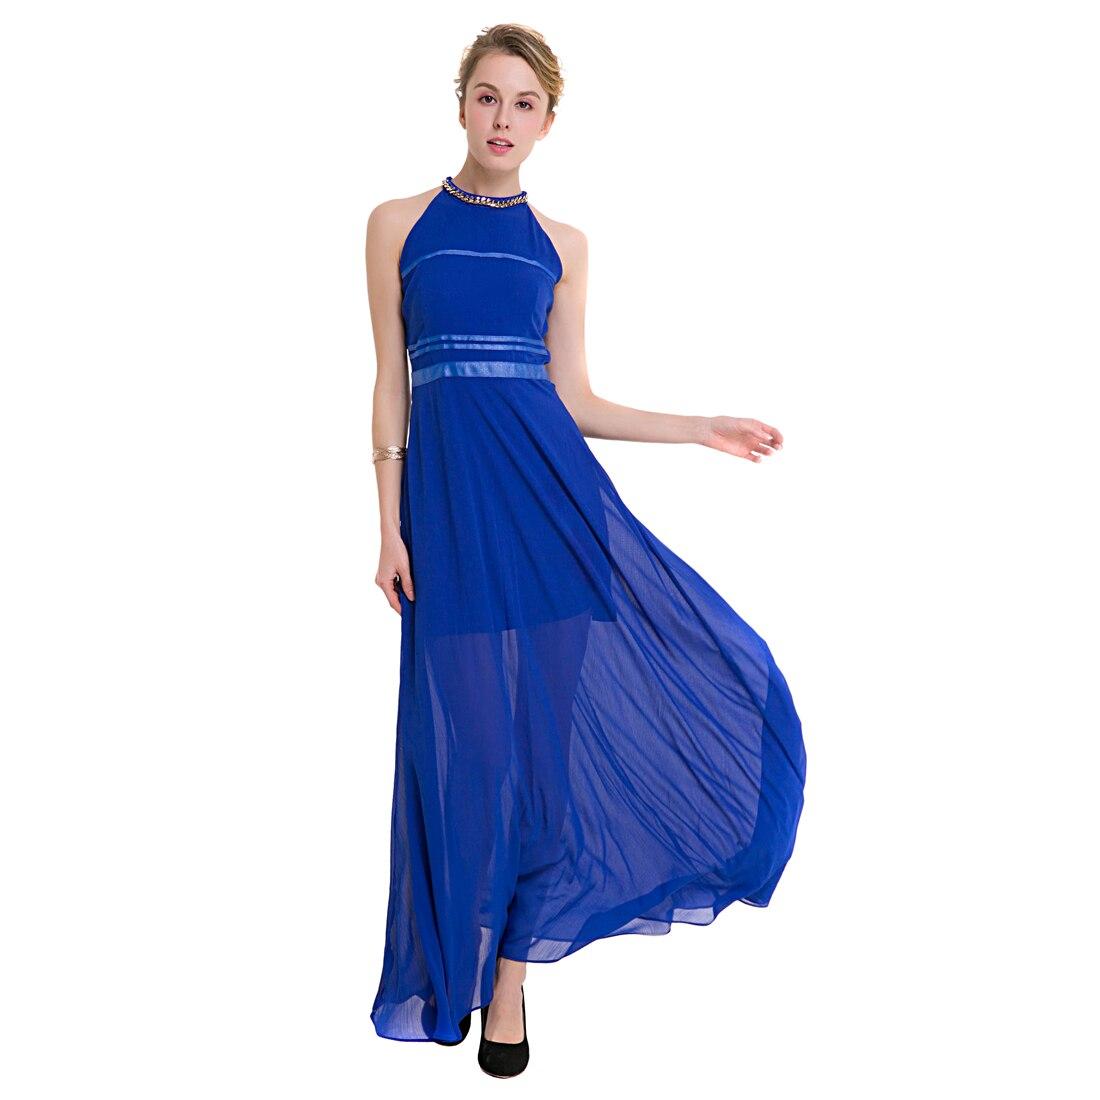 TFGS Original Design Women Elegant Long Chiffon Dress Women Halter Off Shoulder Party Dress Sexy Dresses